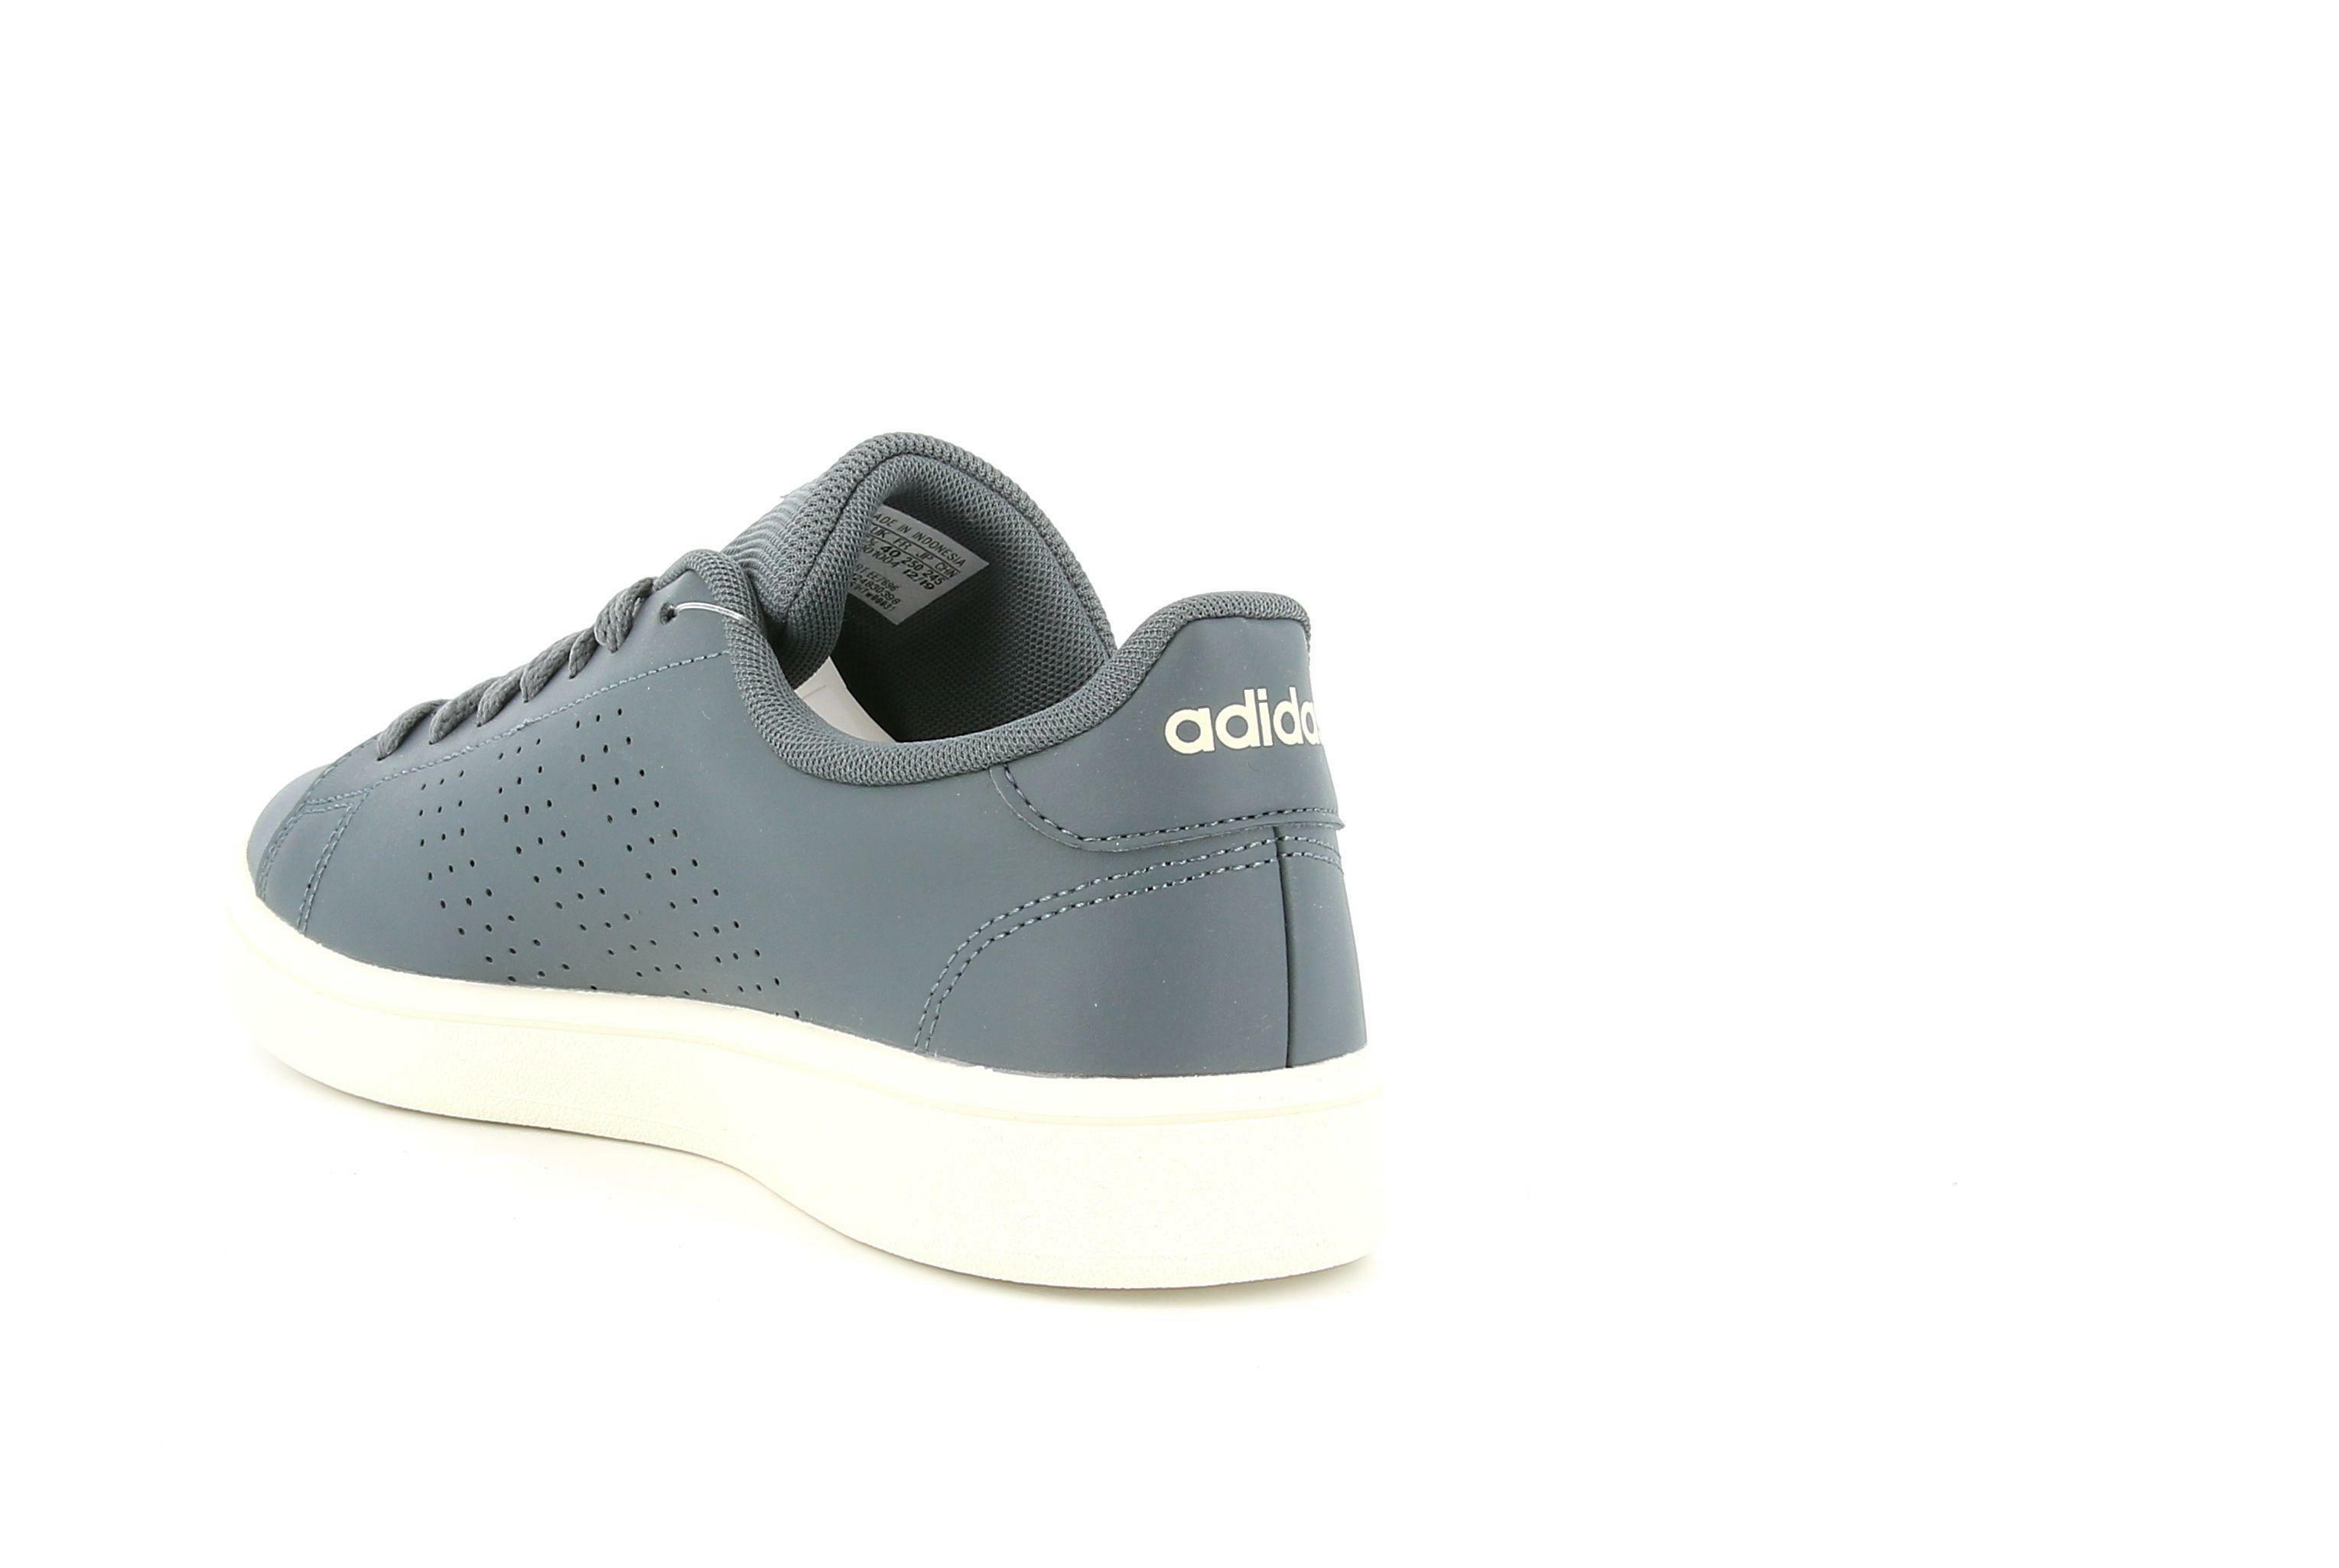 adidas adidas advantage base scarpe da tennis uomo ee7696